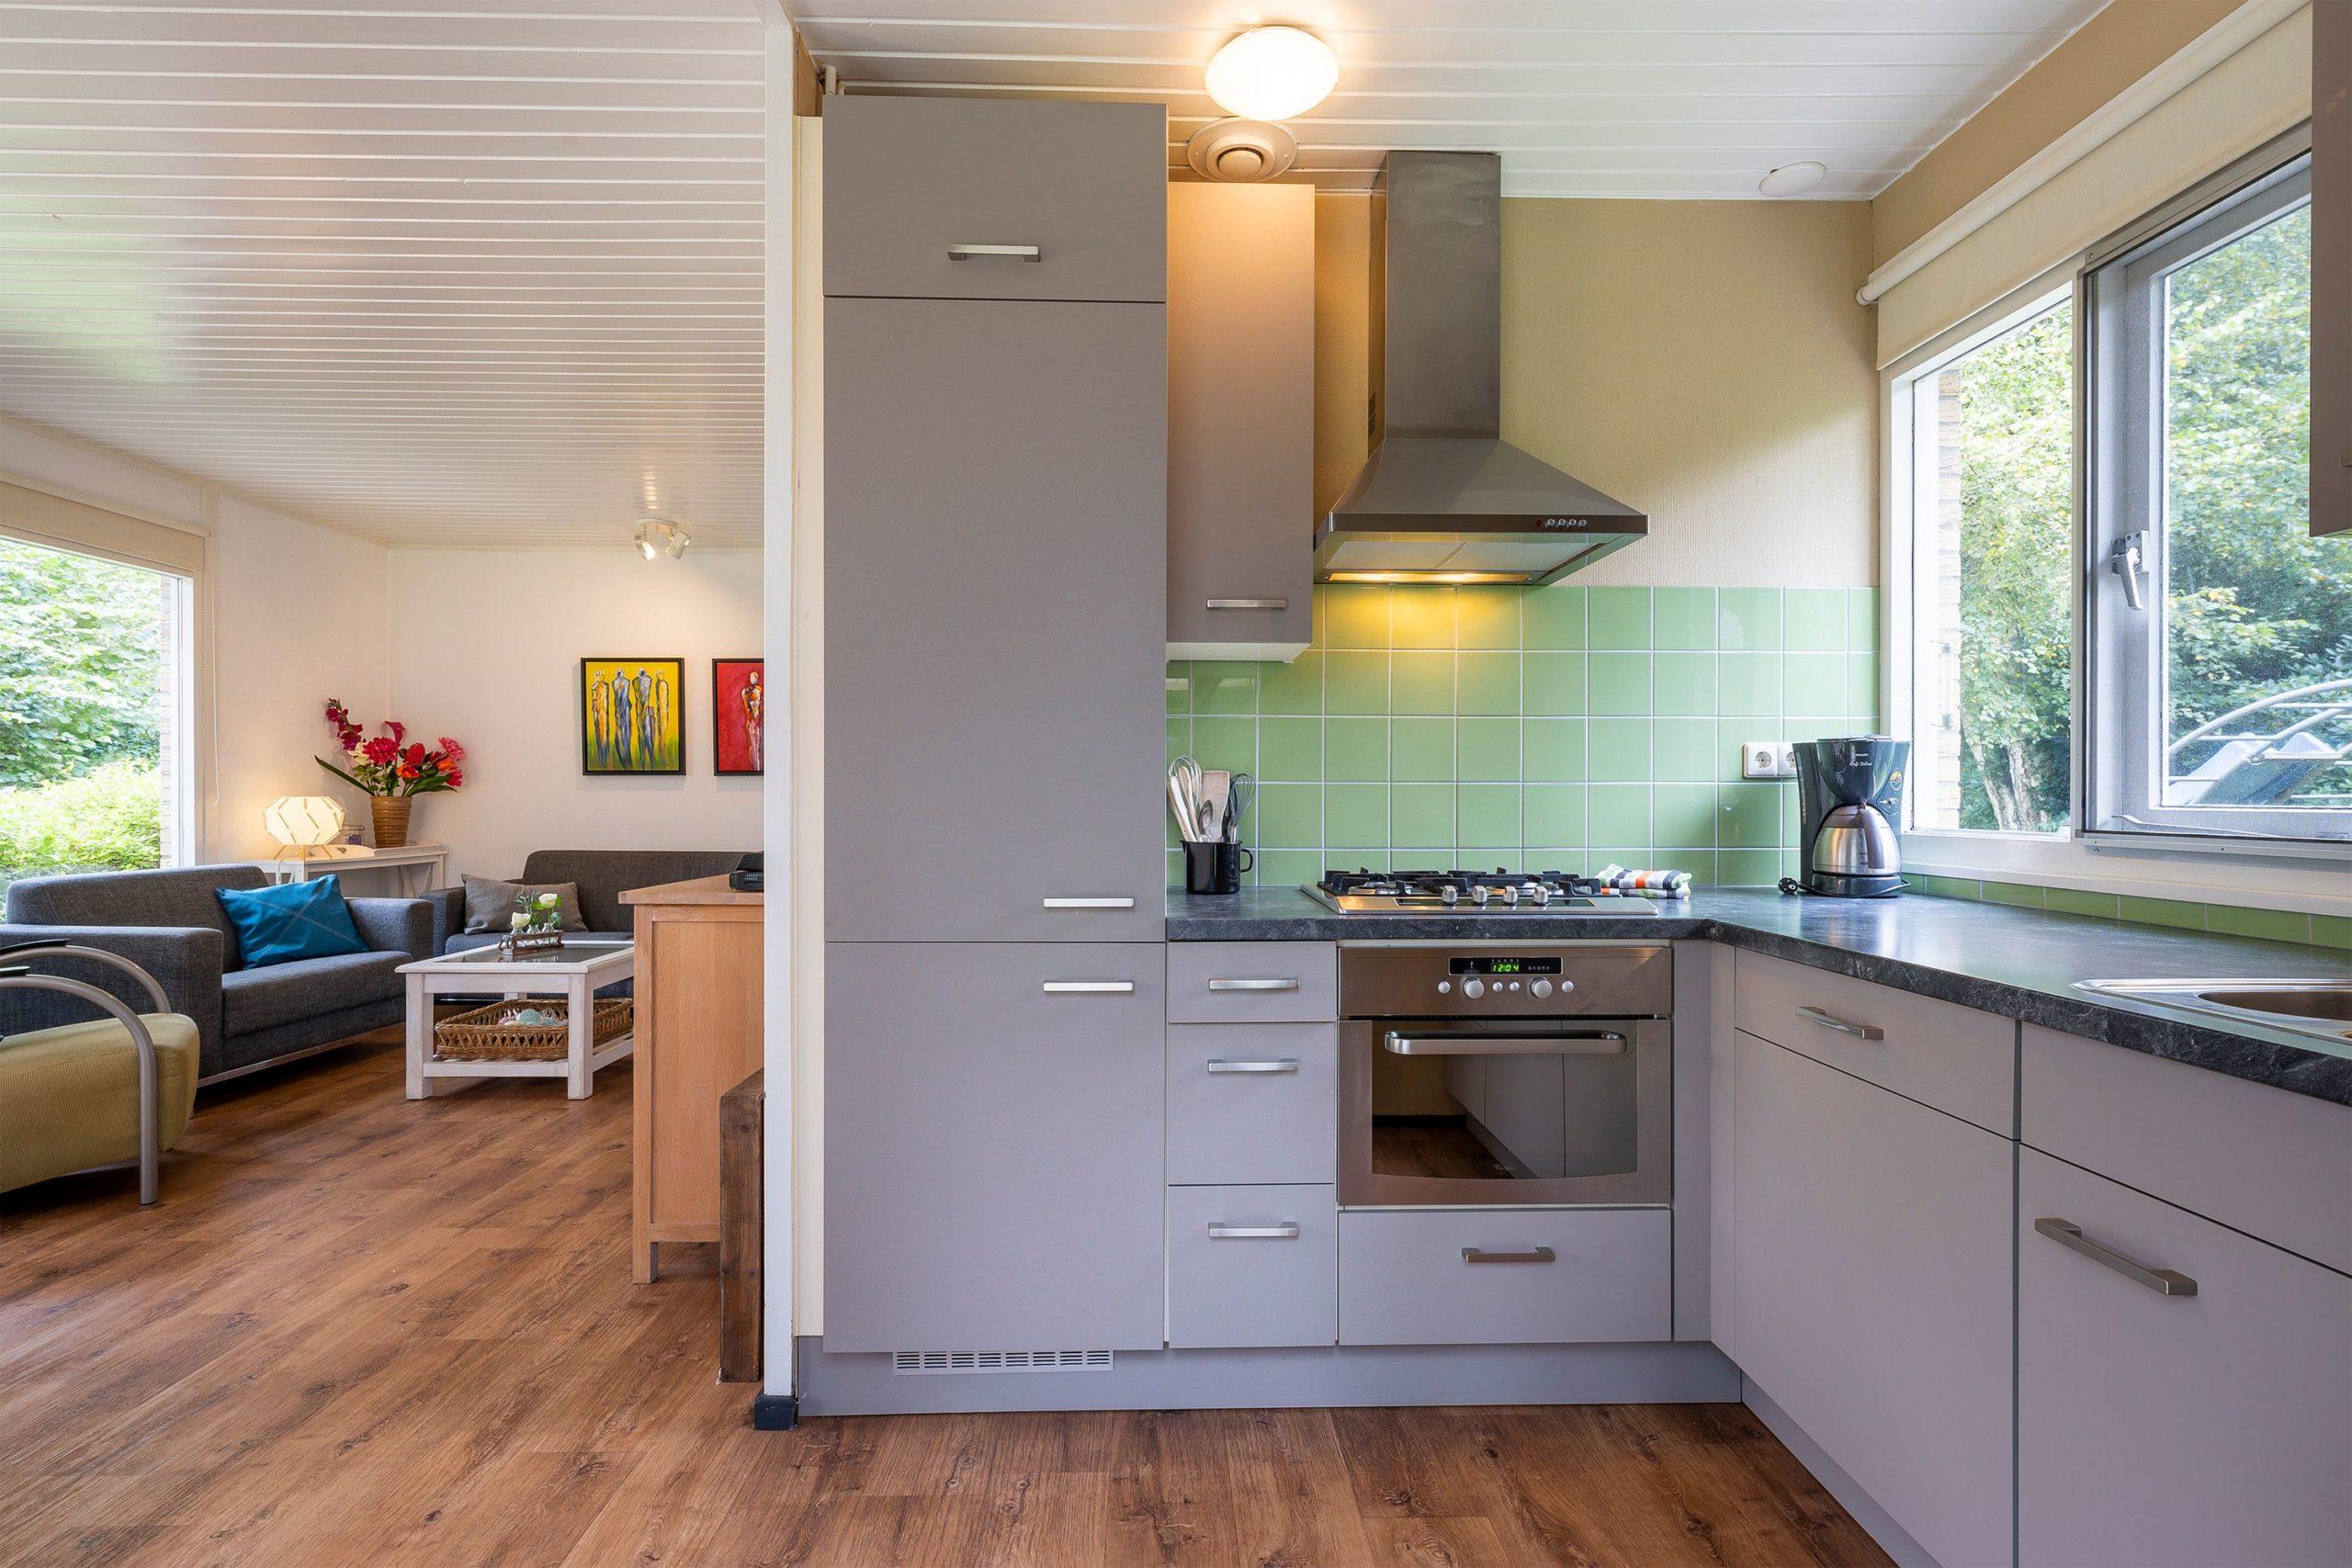 hermelijn-2-keuken-naar-zithoek-leukplekje-nl